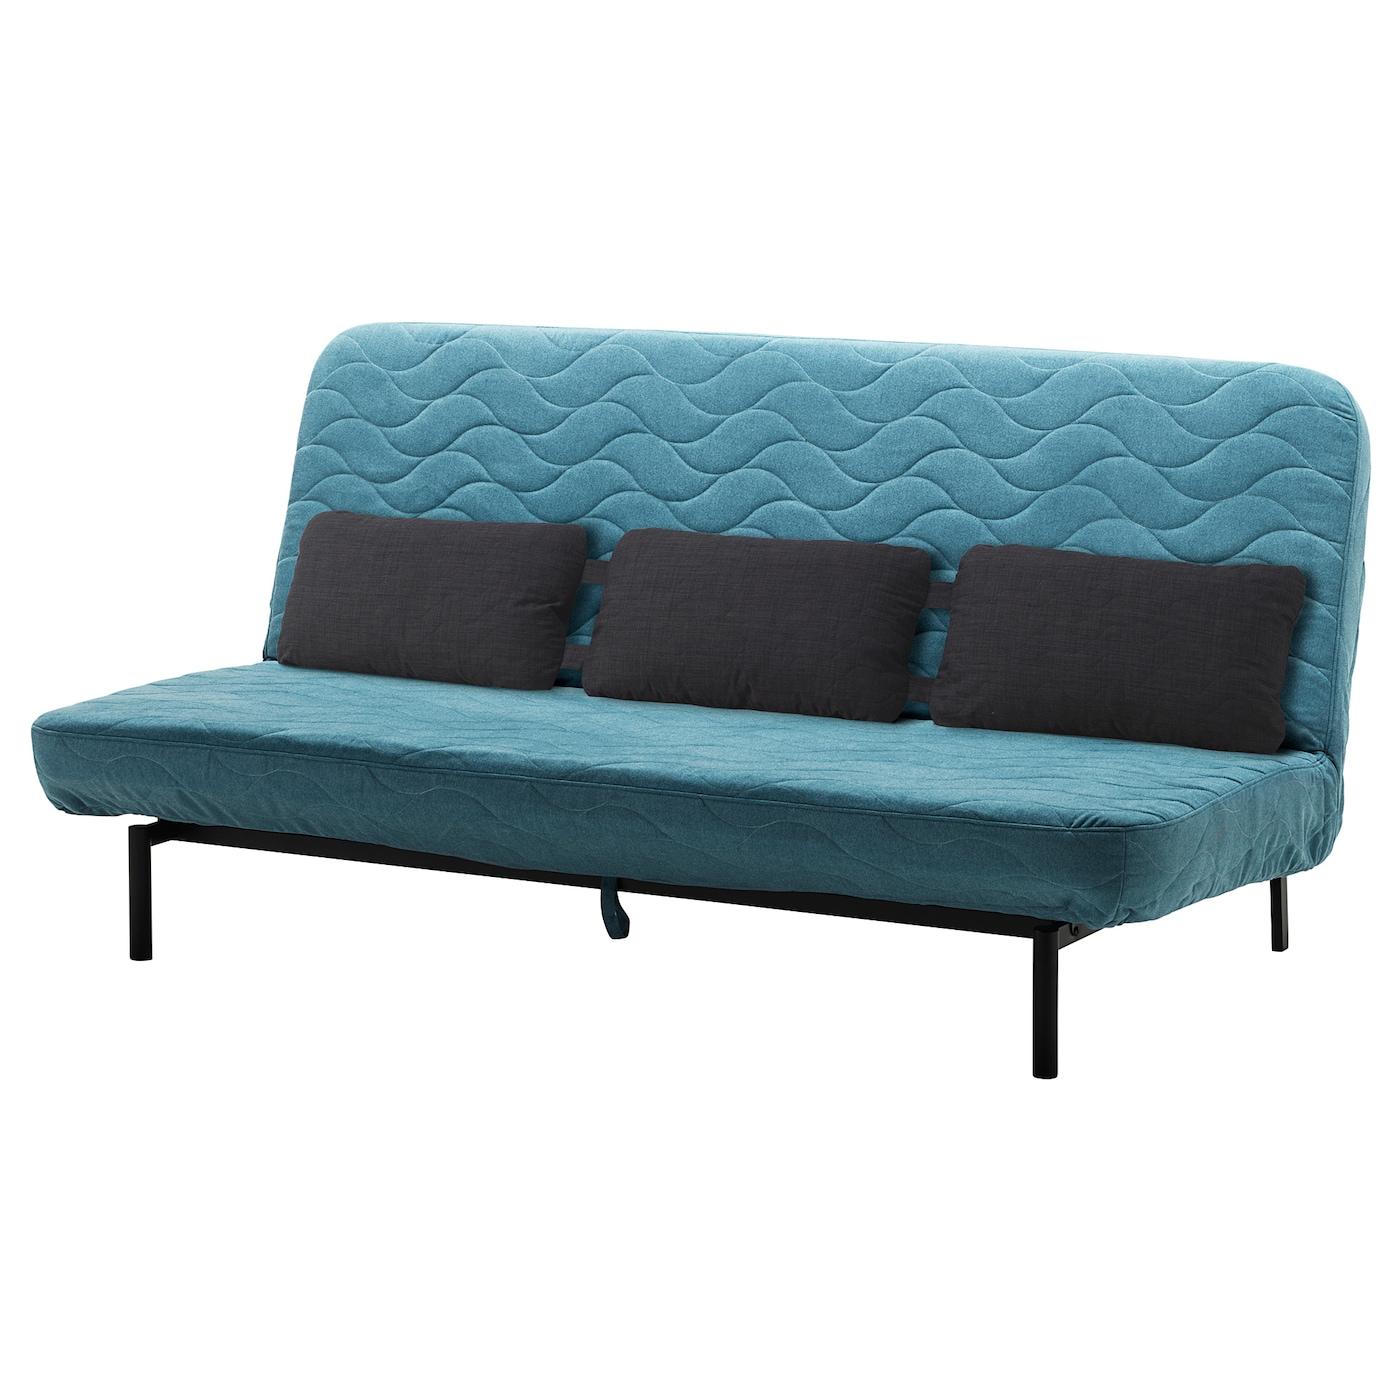 sofa beds ikea ireland dublin. Black Bedroom Furniture Sets. Home Design Ideas